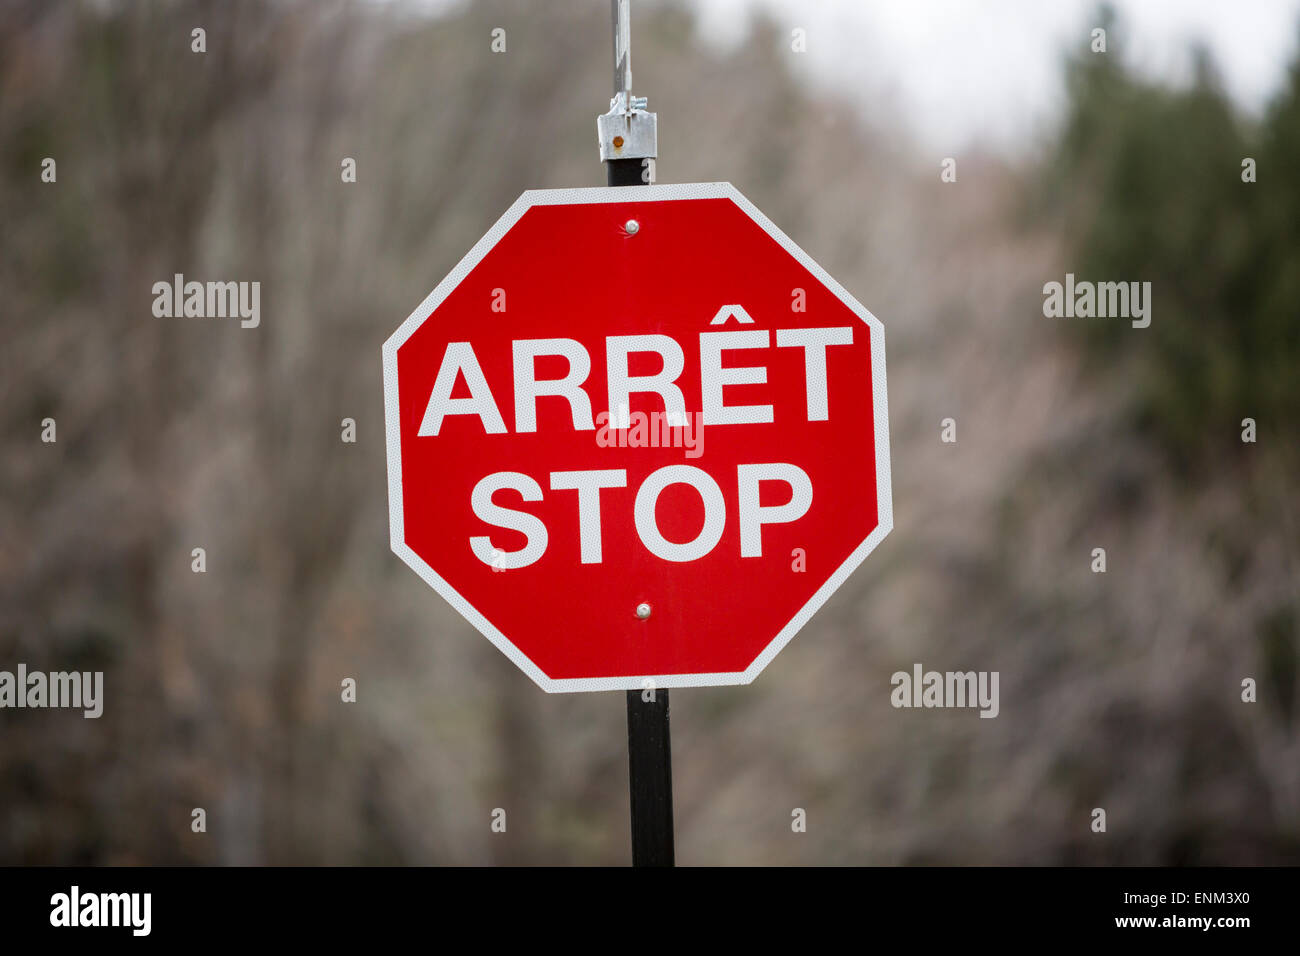 North America, Canada, Quebec, bilingual stop sign - Stock Image